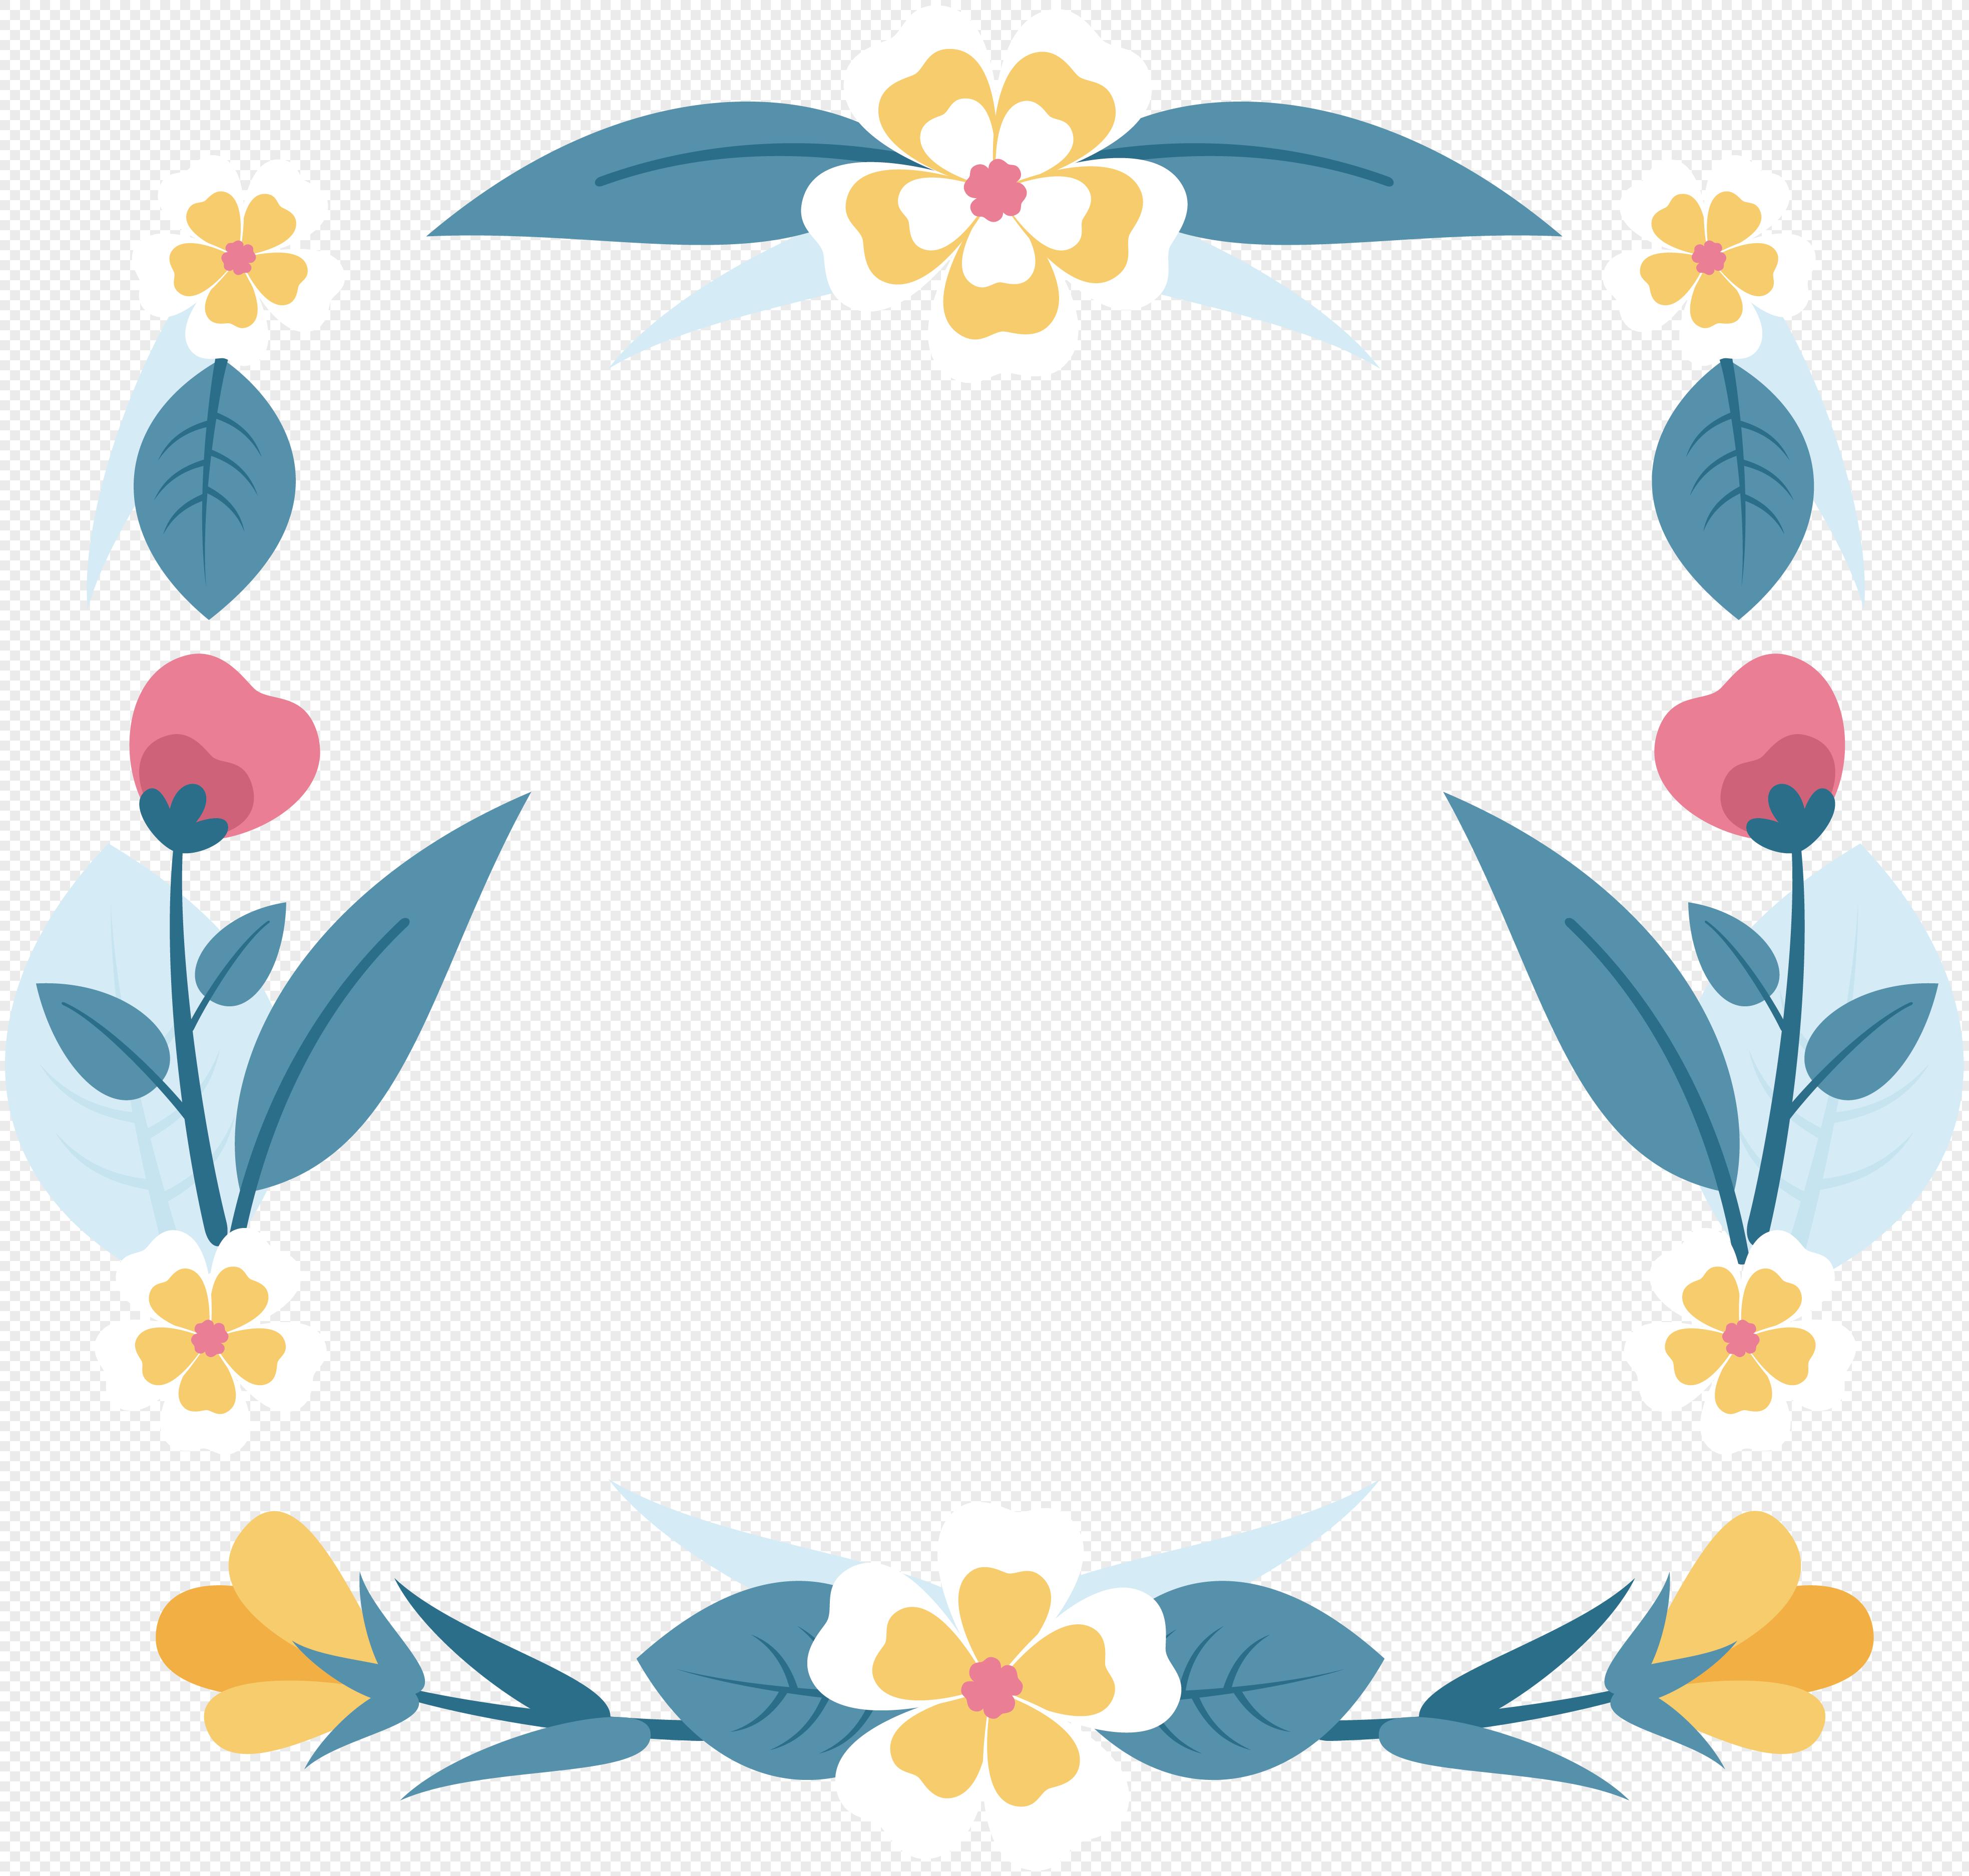 Creative Spring Flower Border Imagepicture 400316243lovepik